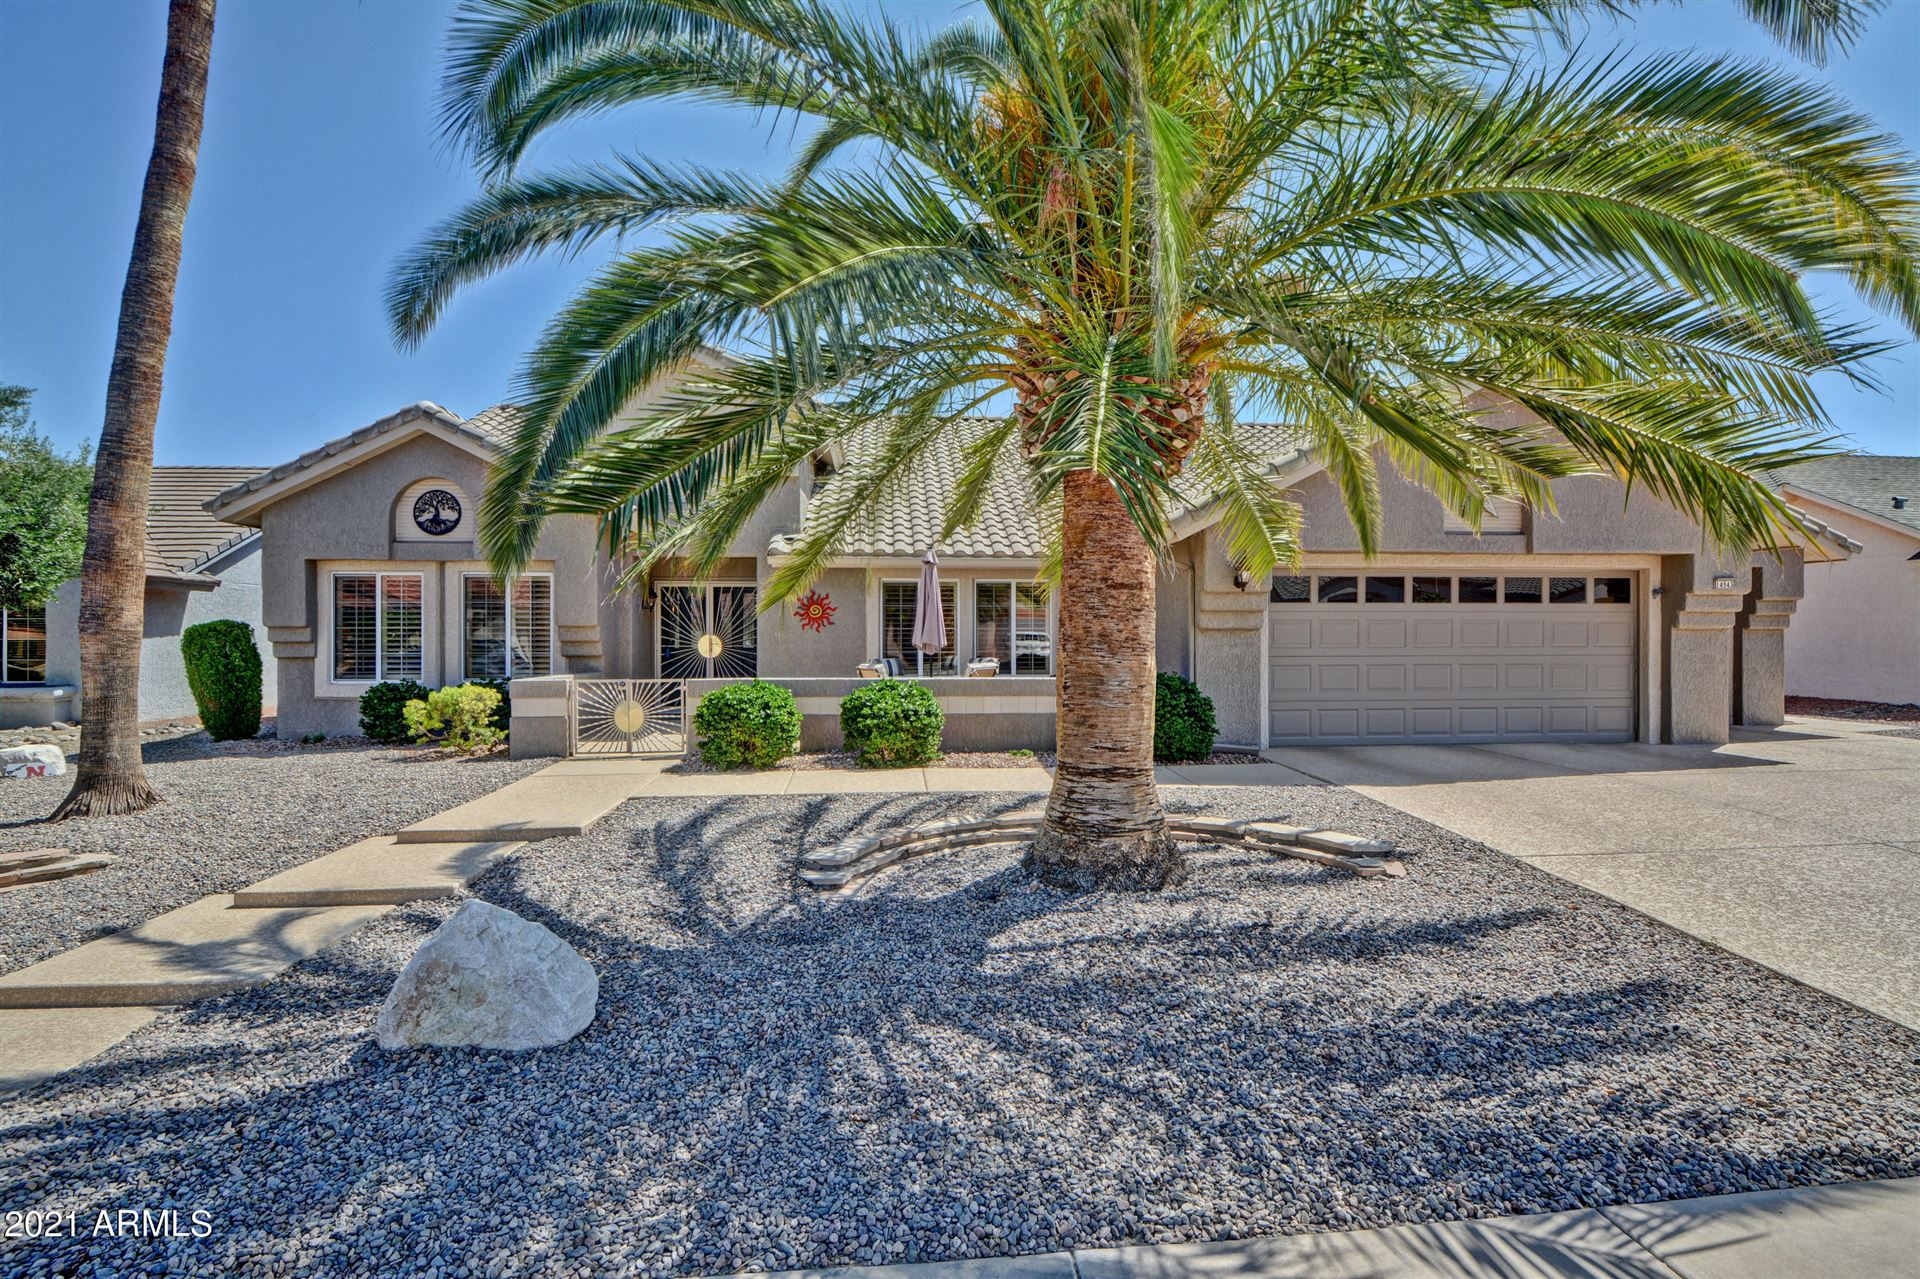 Photo of 14943 W Buttonwood Drive, Sun City West, AZ 85375 (MLS # 6220991)